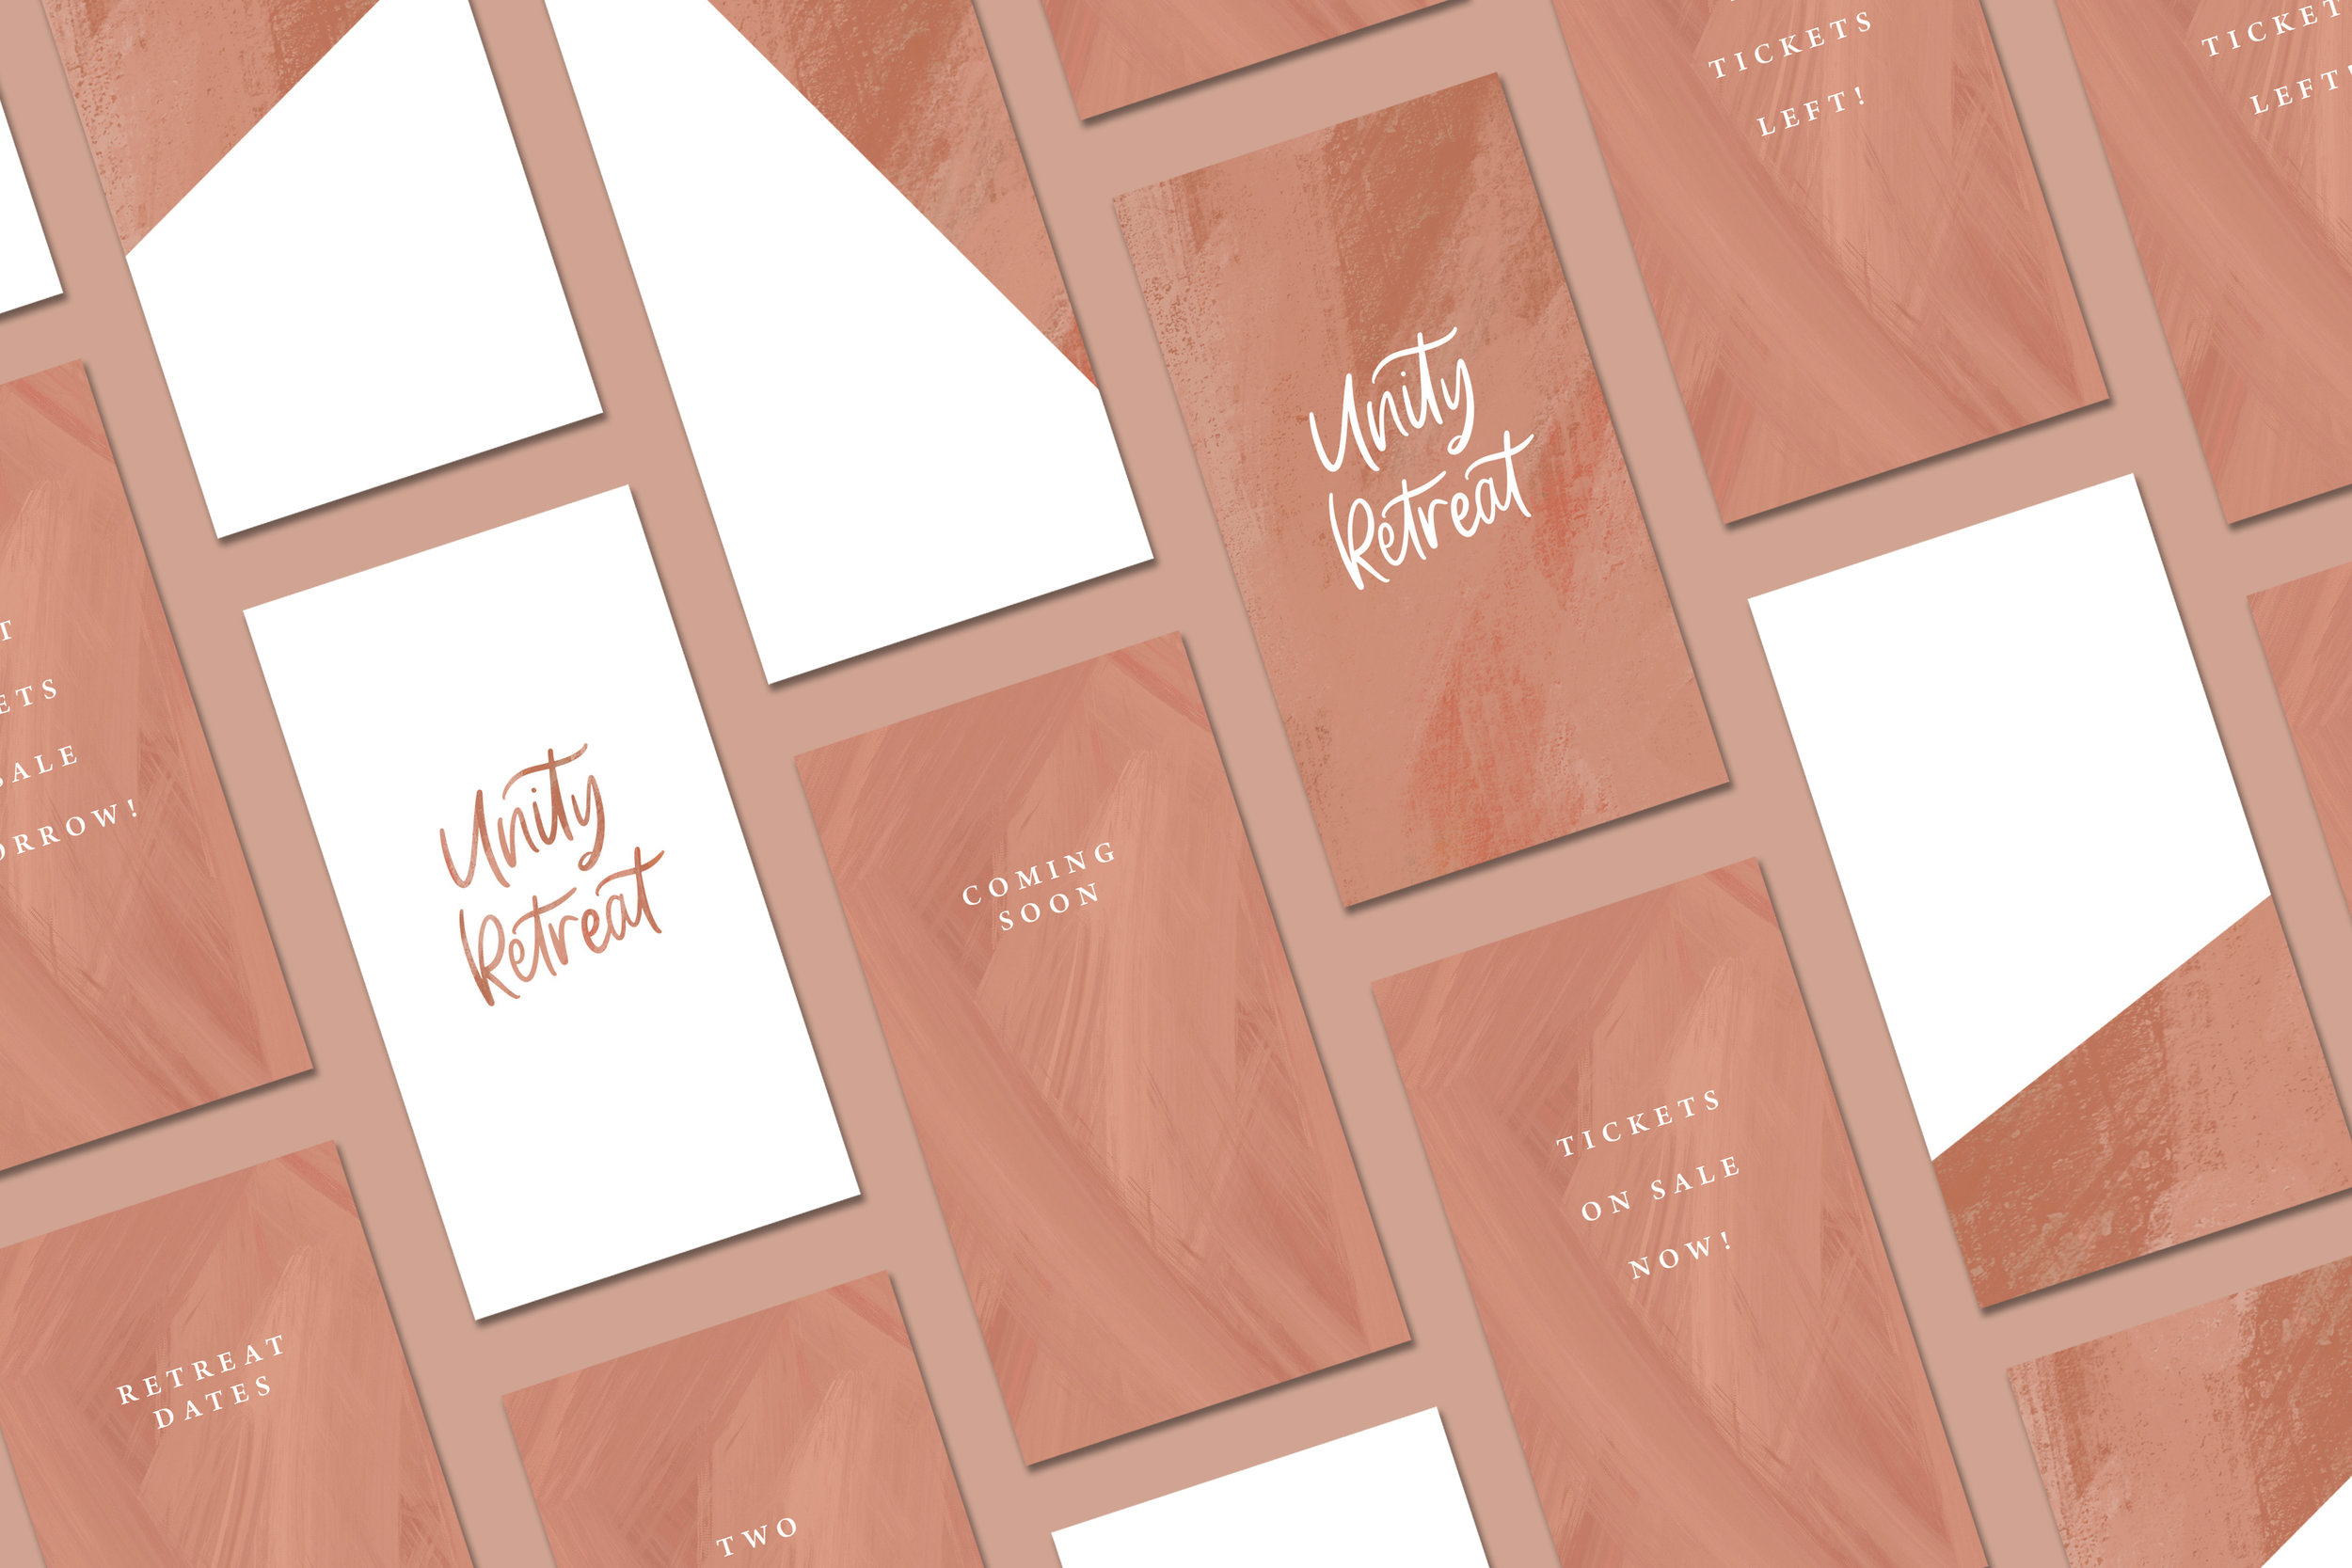 Unity Retreat - Event Logo Design and Social Media Kit - Bexley Design Co Branding